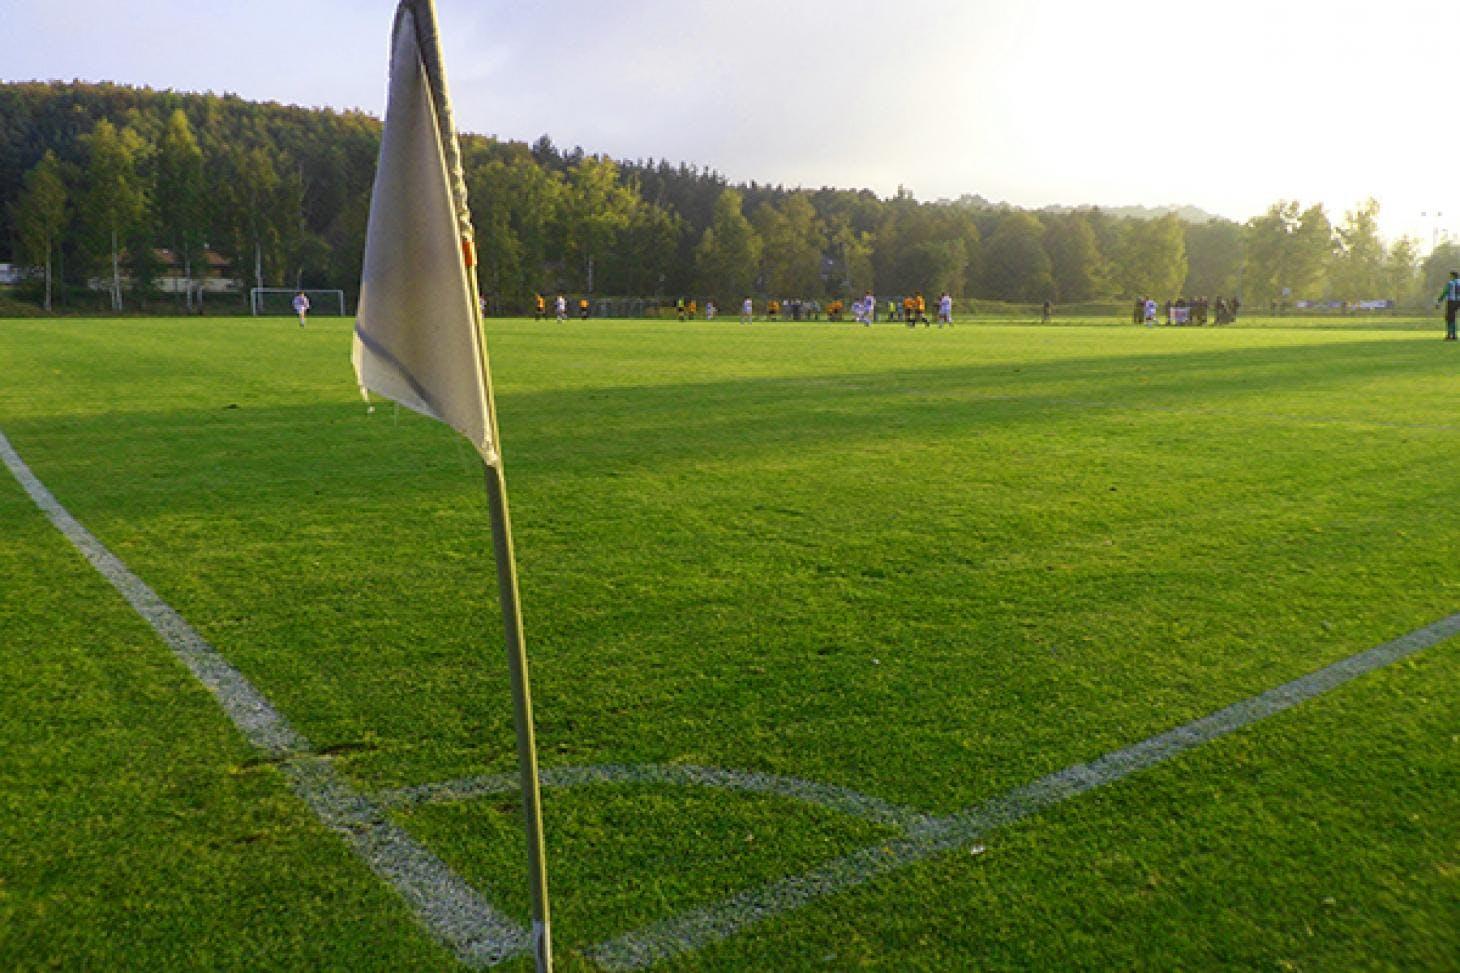 Gurnell Leisure Centre 11 a side | Grass football pitch